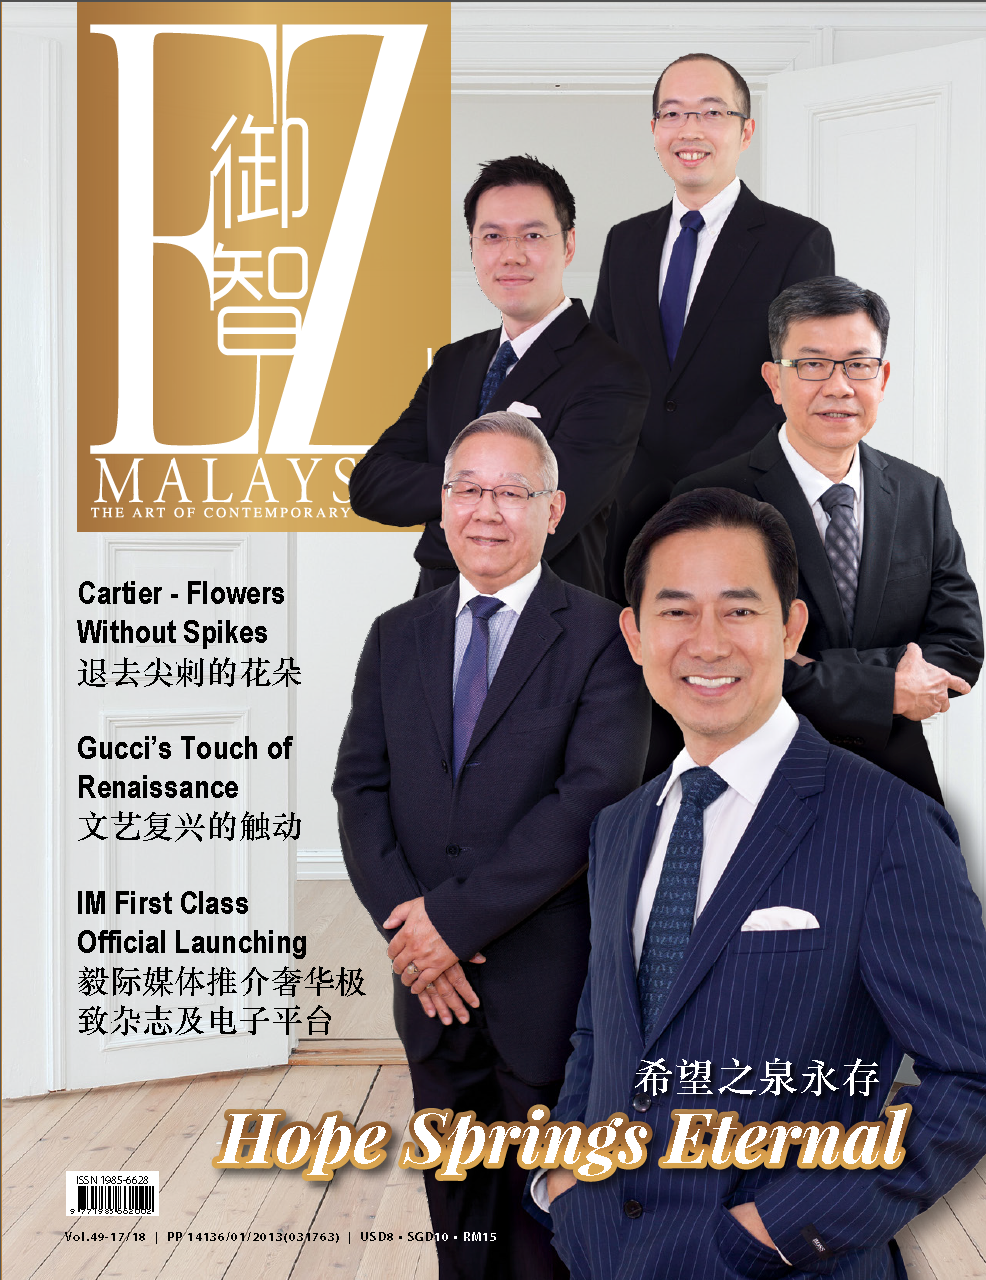 Dr-Colin-Lee-Soon-Soo_Alpha-Fertility-Centre_EZ-MALAYSIA